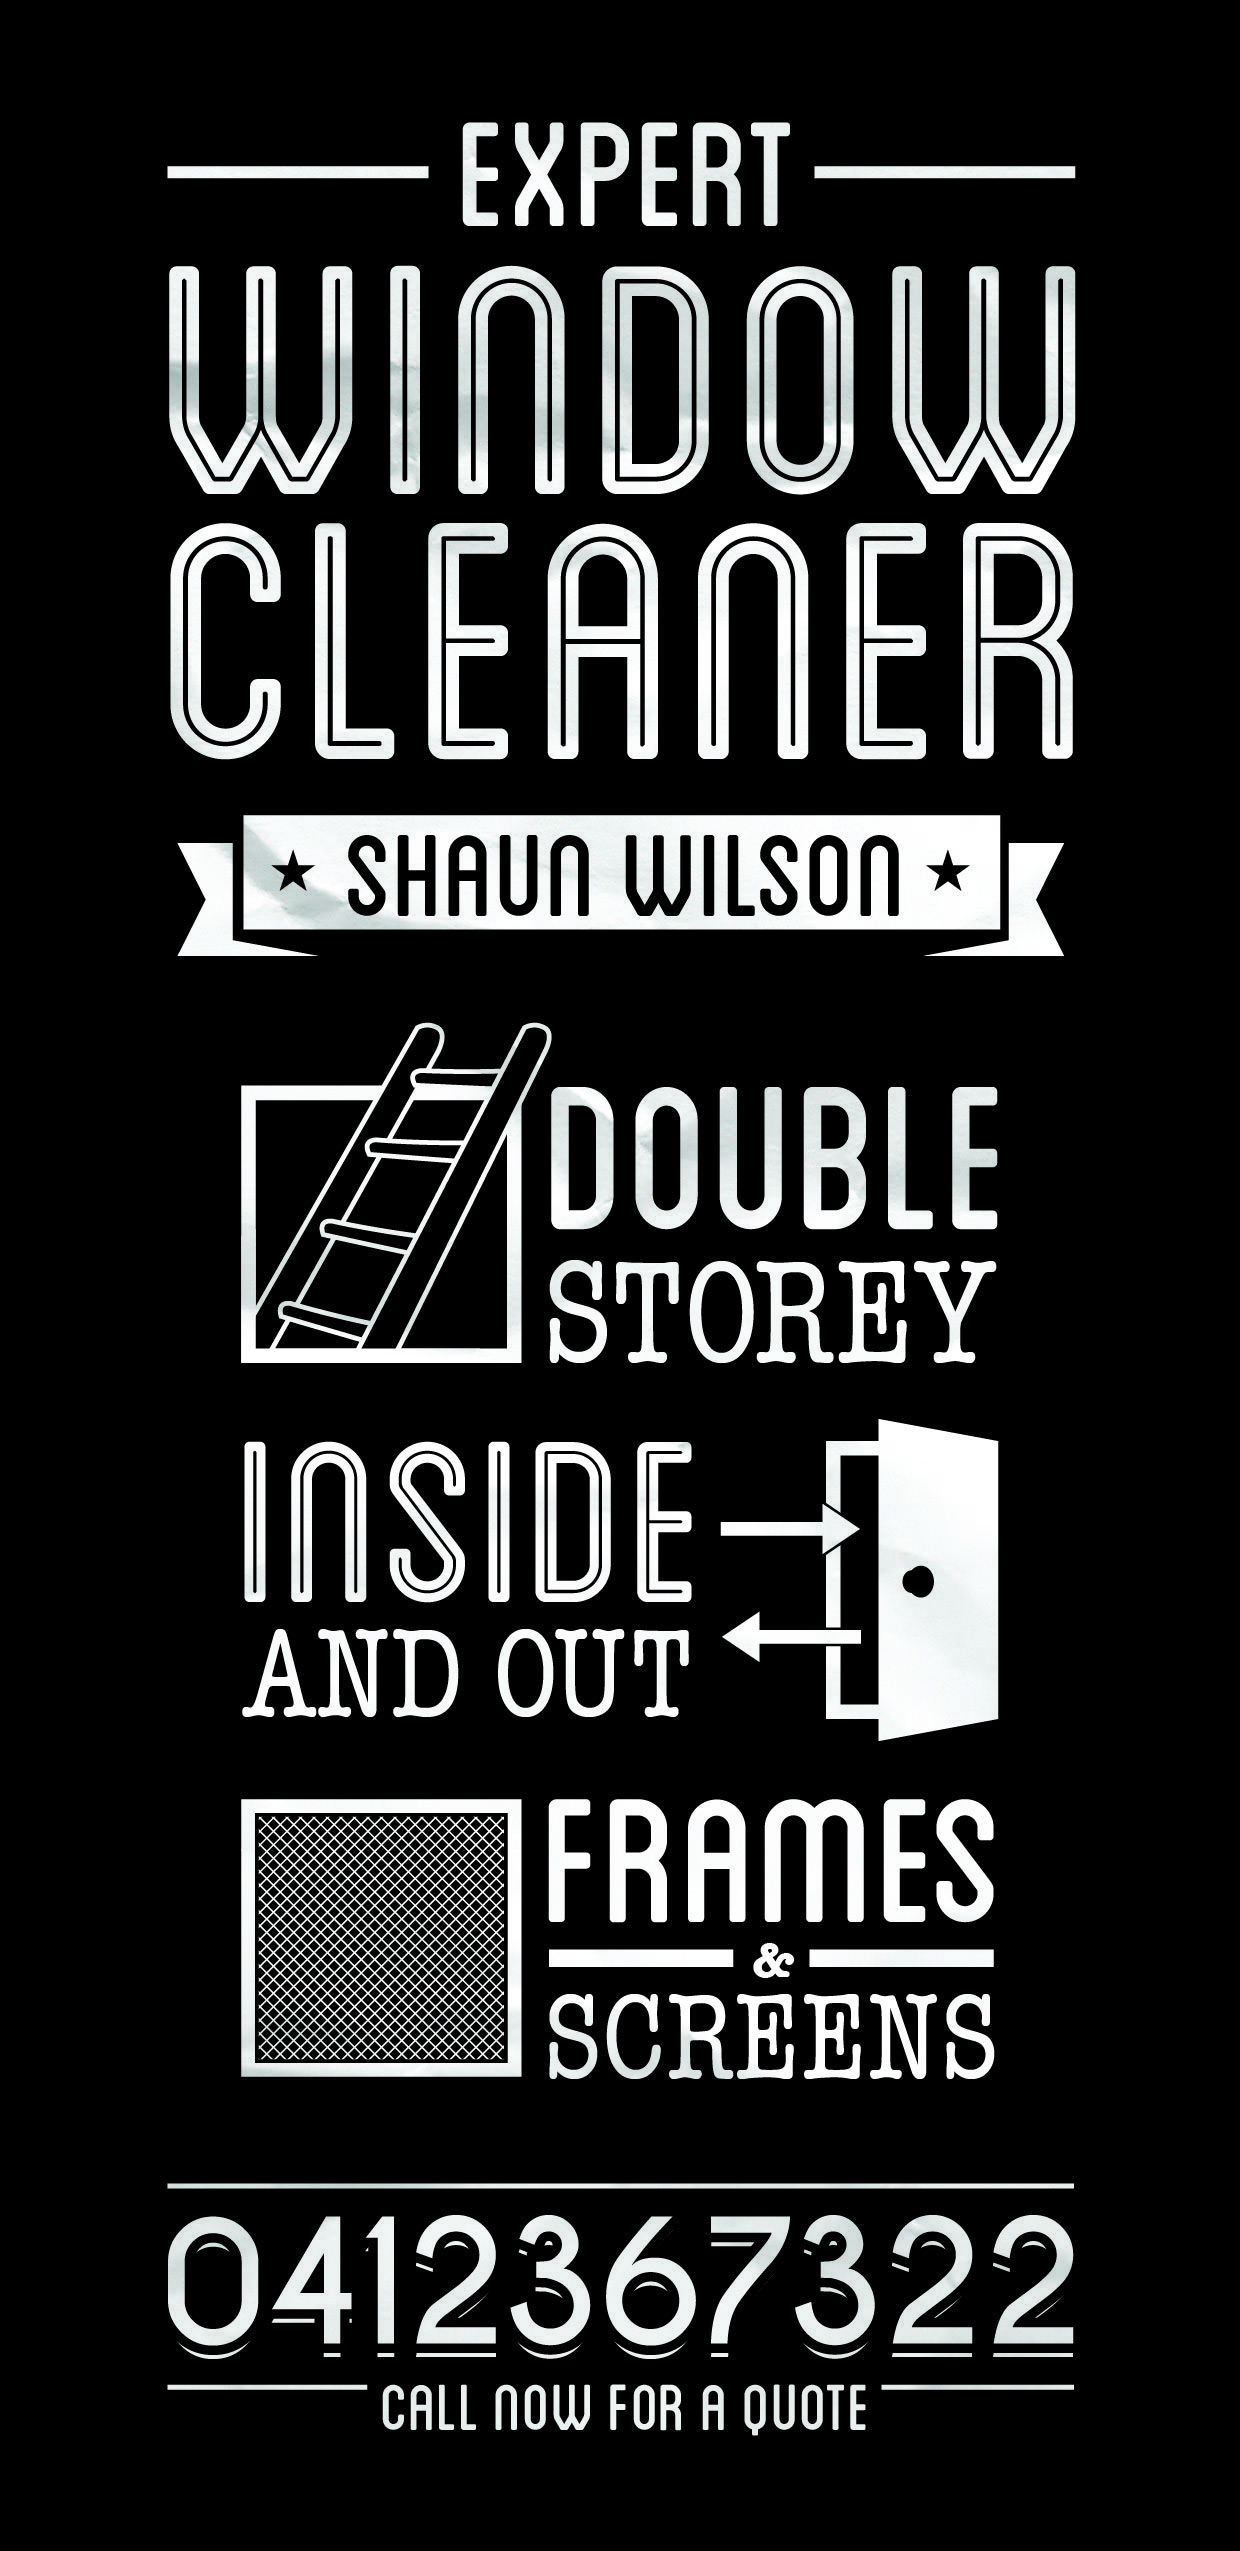 Window cleaning flyer design. | Graphic Design | Pinterest